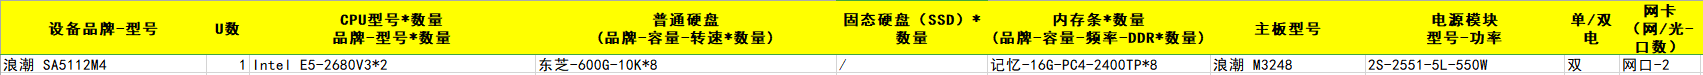 浪潮 SA5112M4 Intel E5-2680V3*2 东芝-600G-10K*8 记忆-16G-PC4-2400TP*8